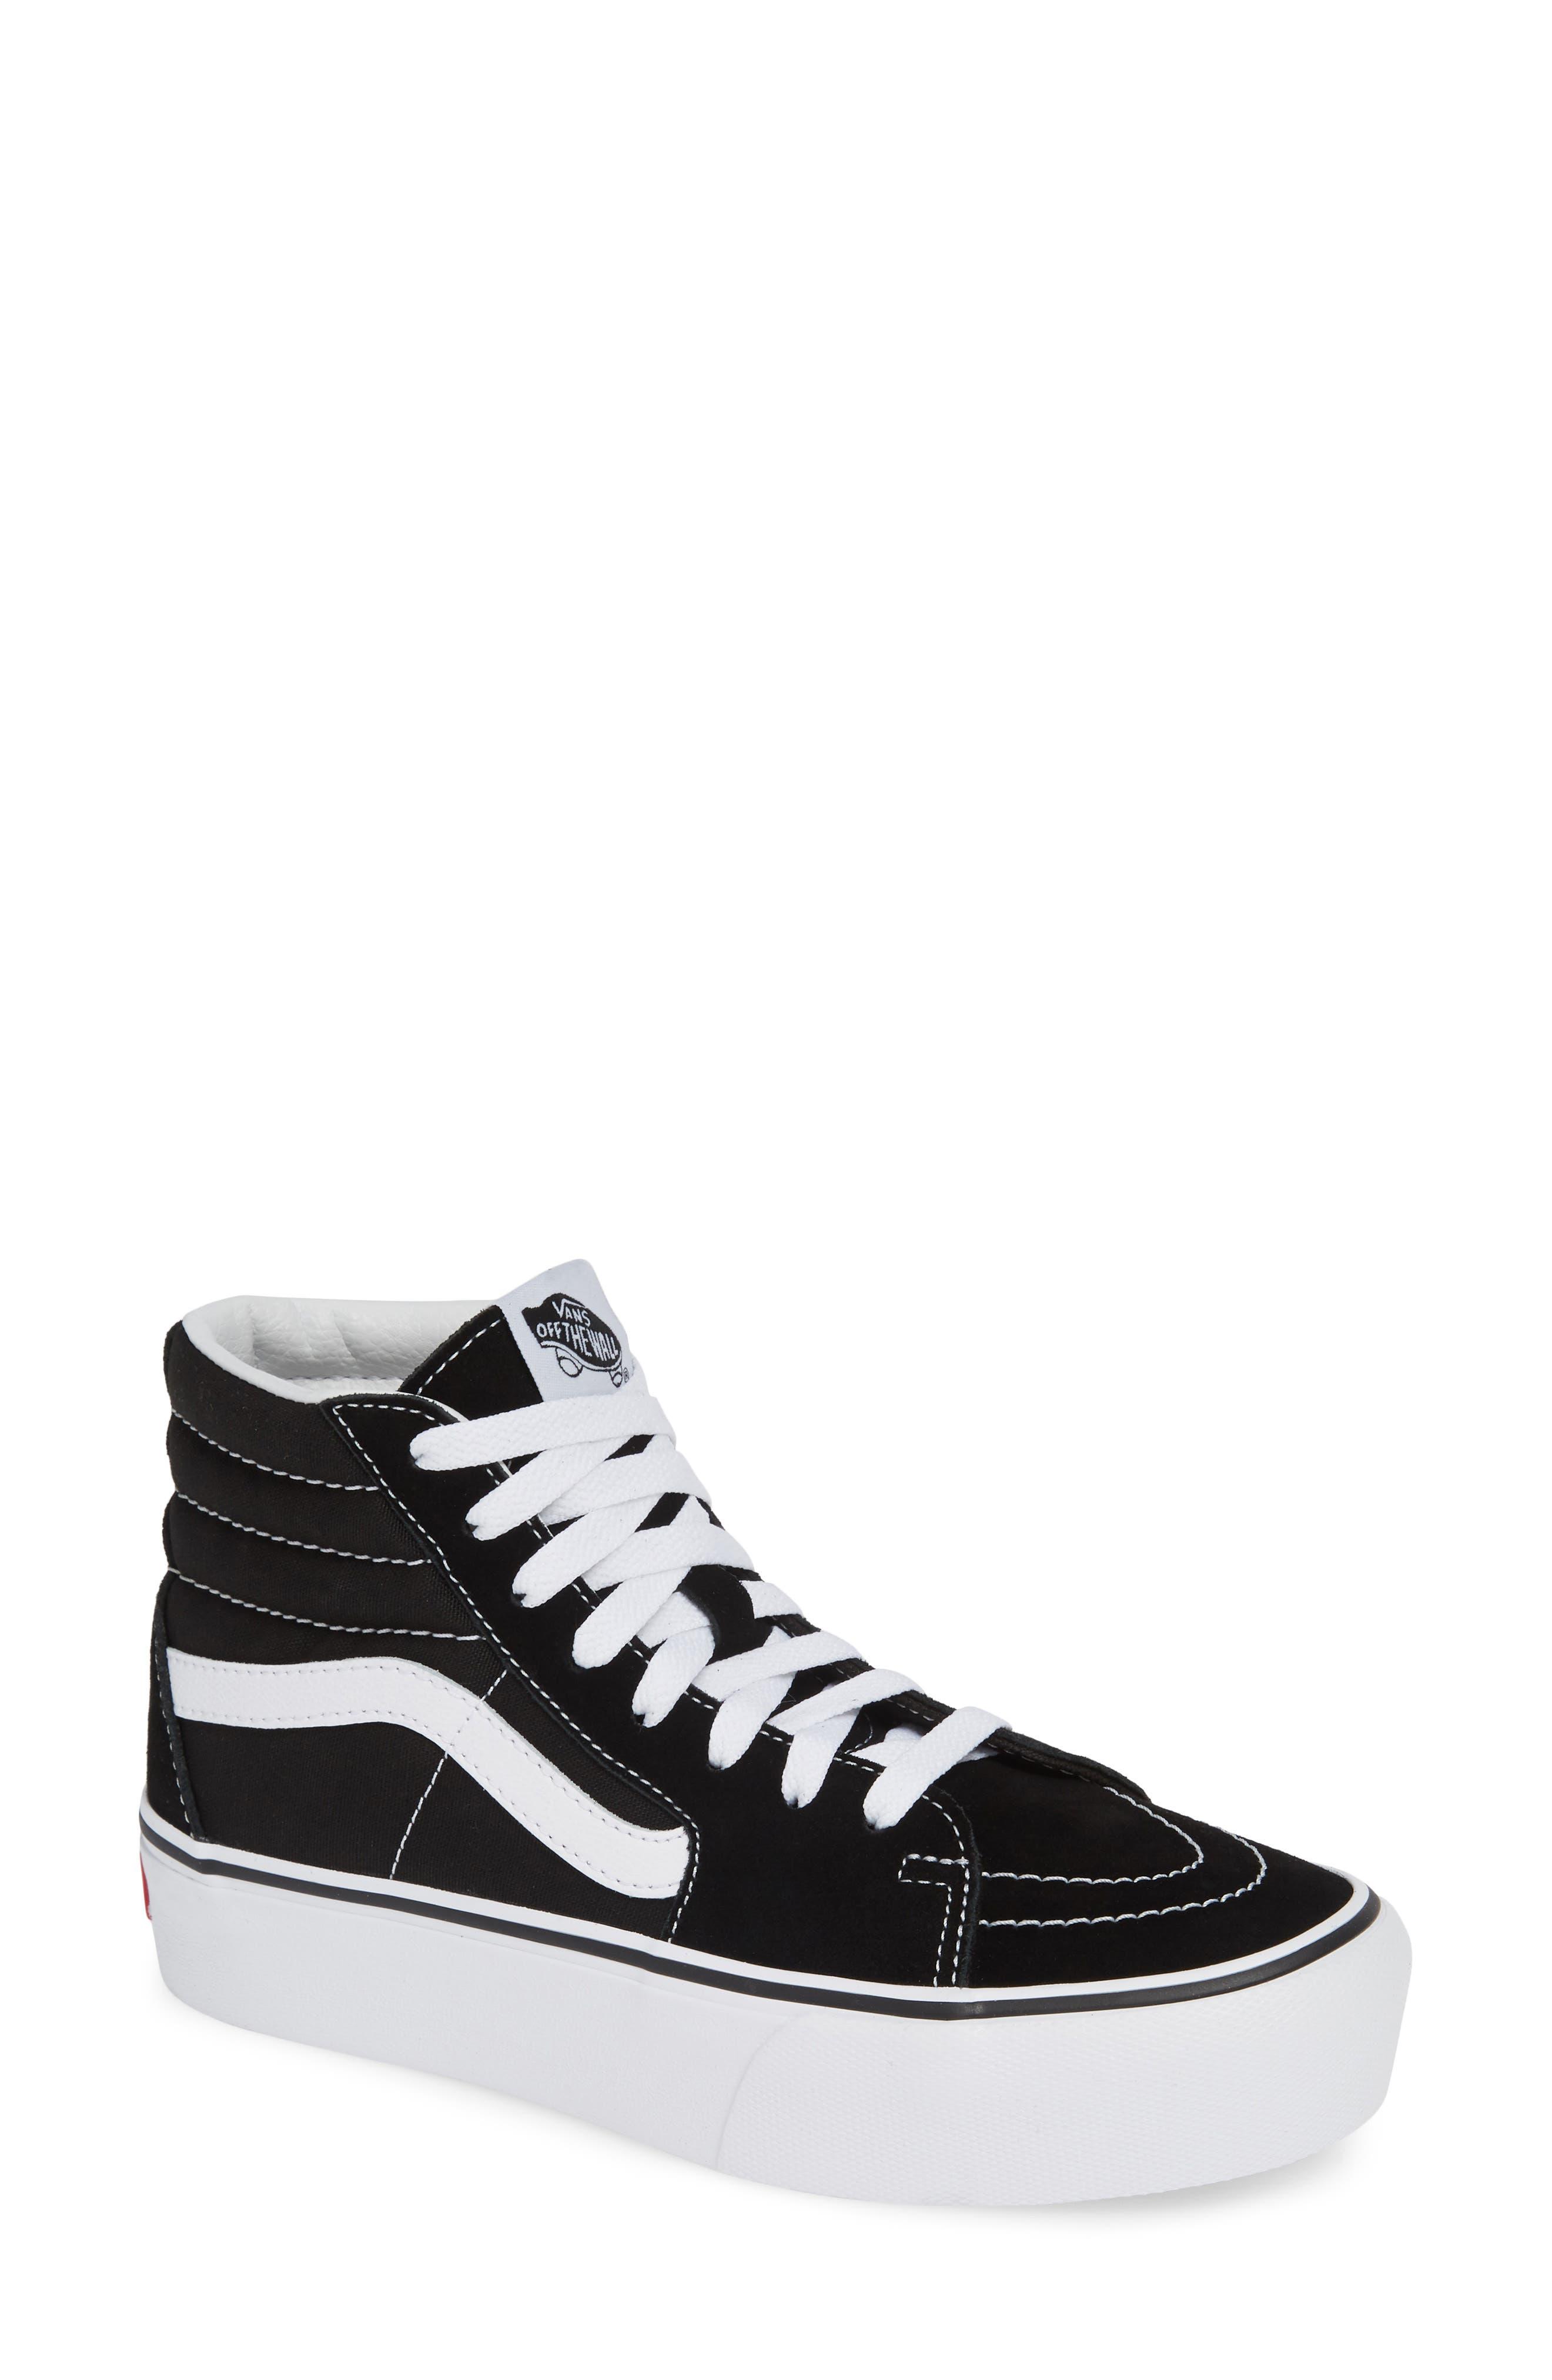 VANS, Sk8-Hi Platform Sneaker, Main thumbnail 1, color, BLACK/ TRUE WHITE